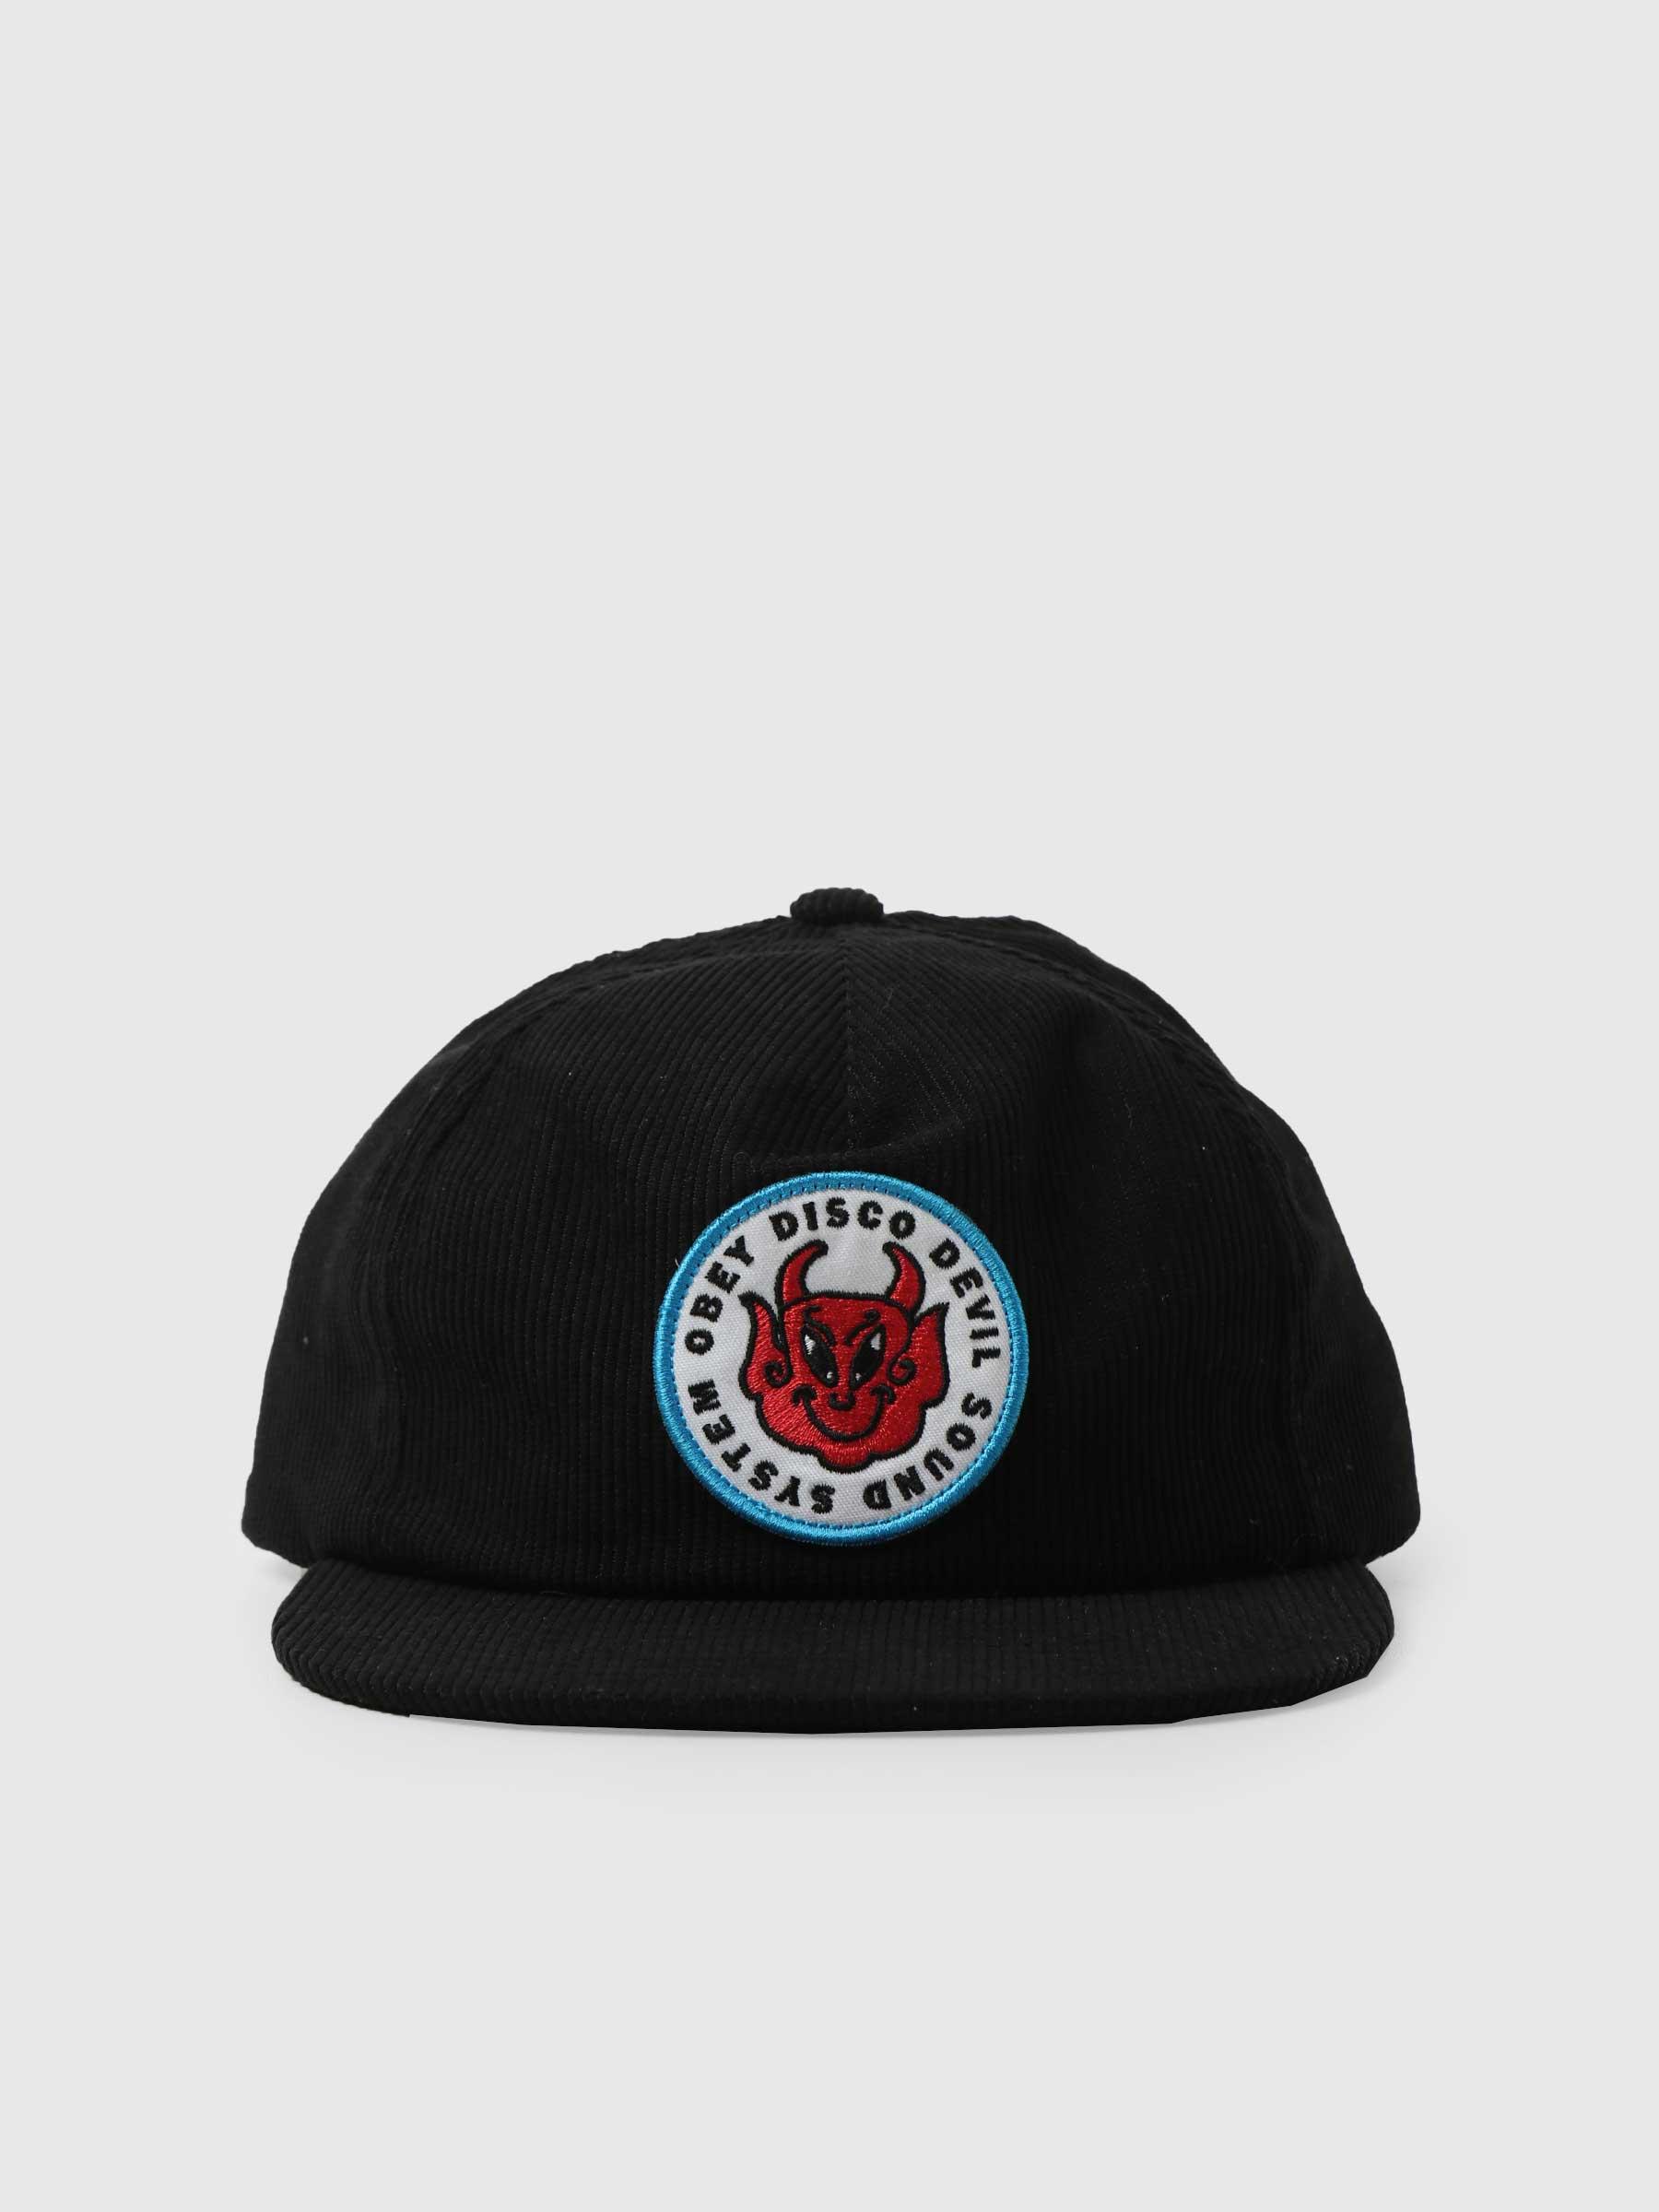 Obey Disco Devil 6 Panel Hat Black 100580294